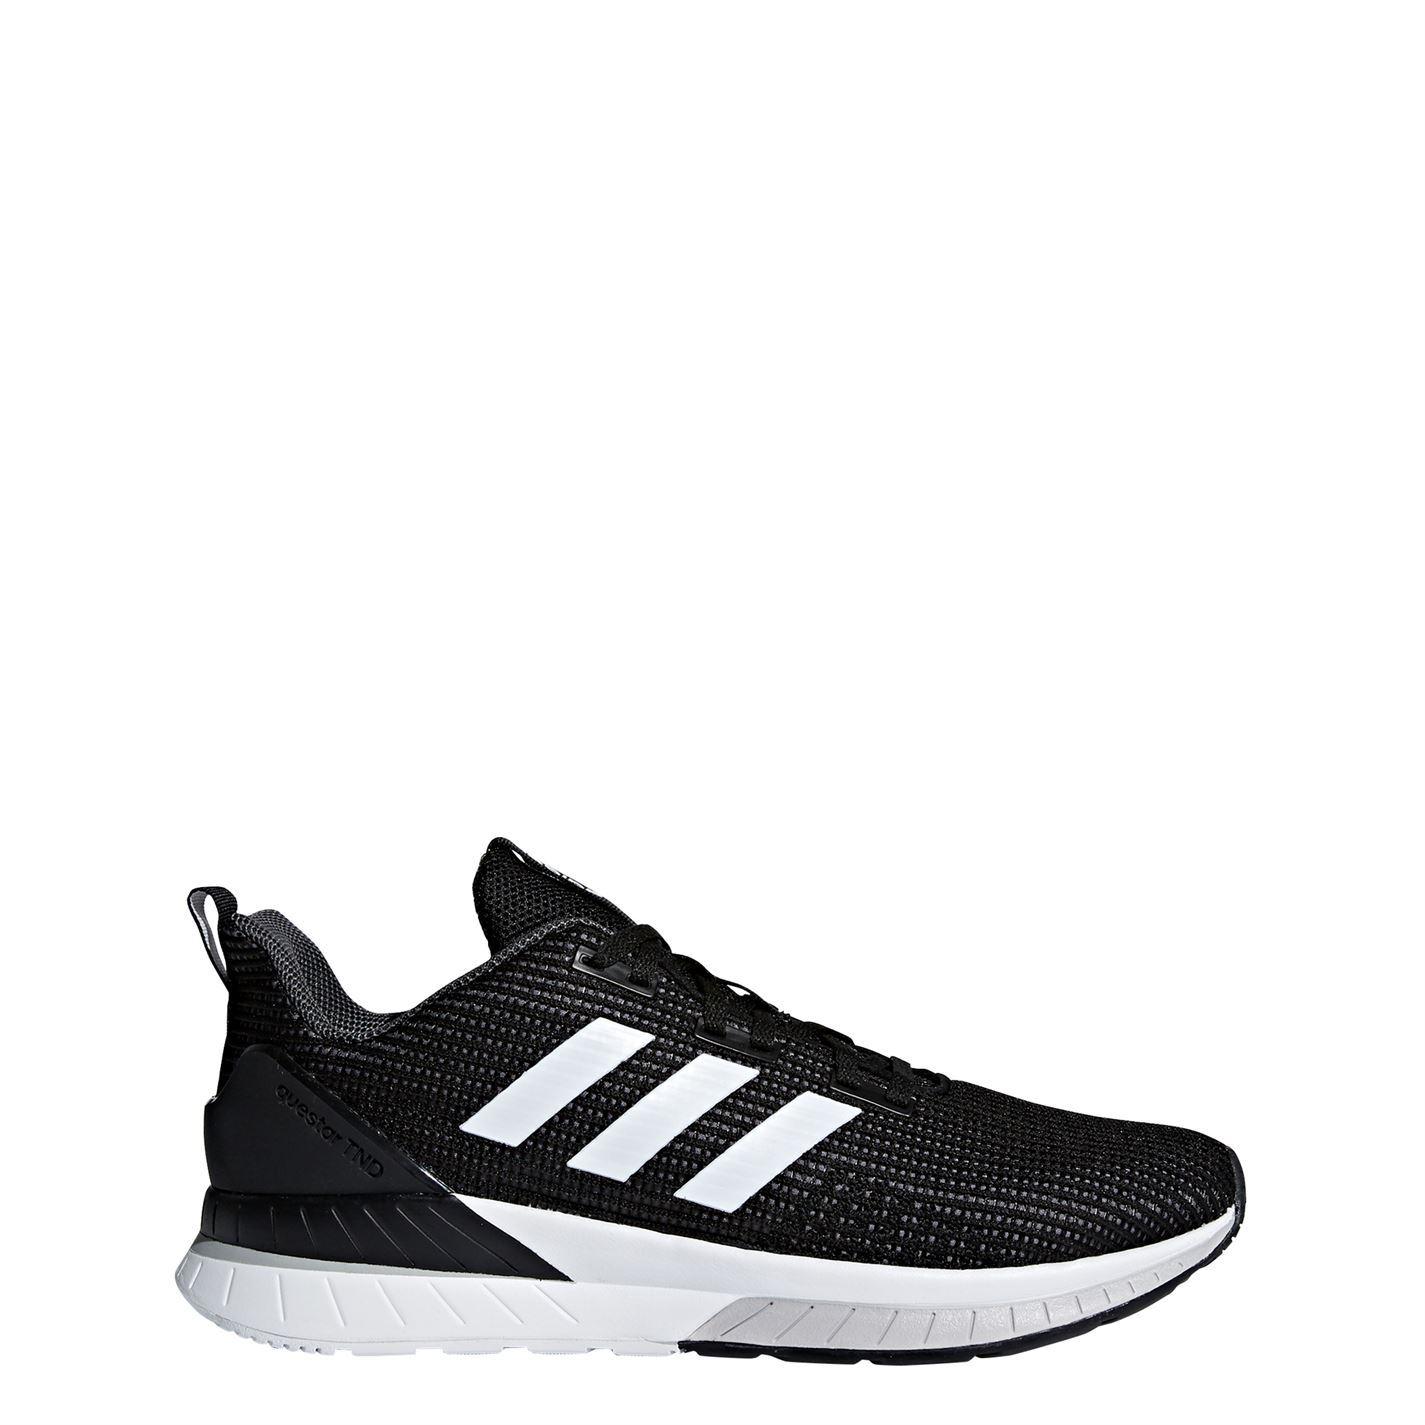 Adidas Questar para Tnd para Questar hombre Caballeros corredores 1362d9